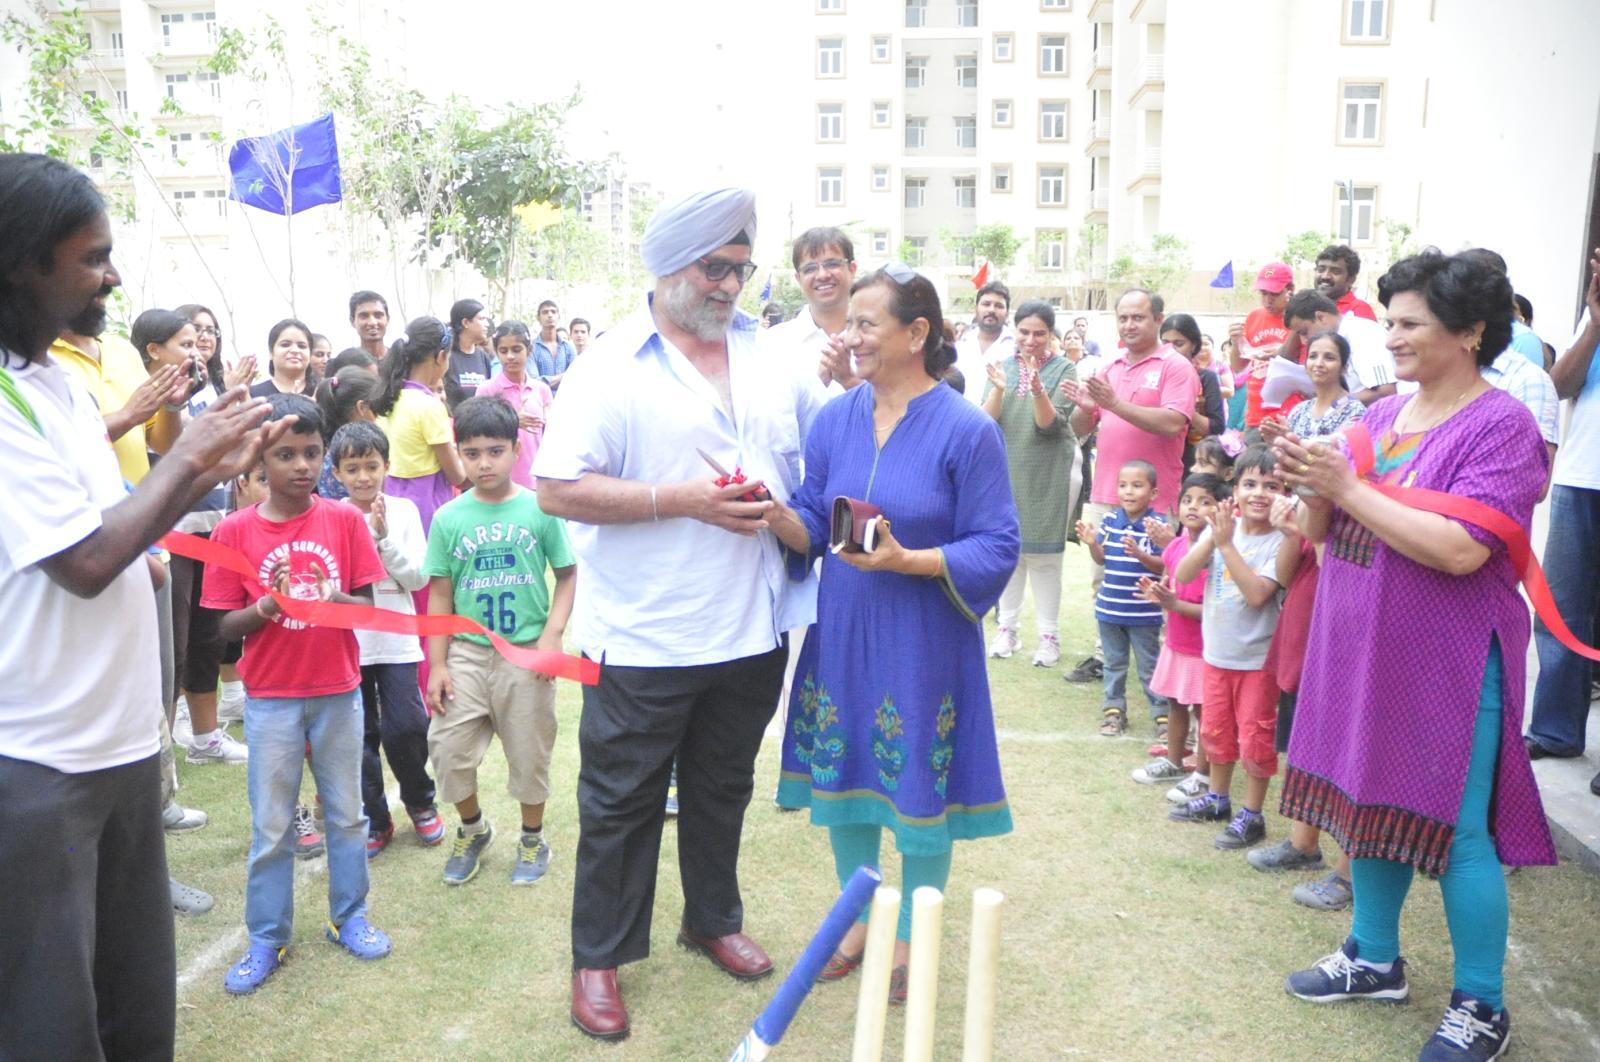 IWS Gurgaon - Indus Cricket Academy inaugurated by Bishan Bedi and Sunita Sharma